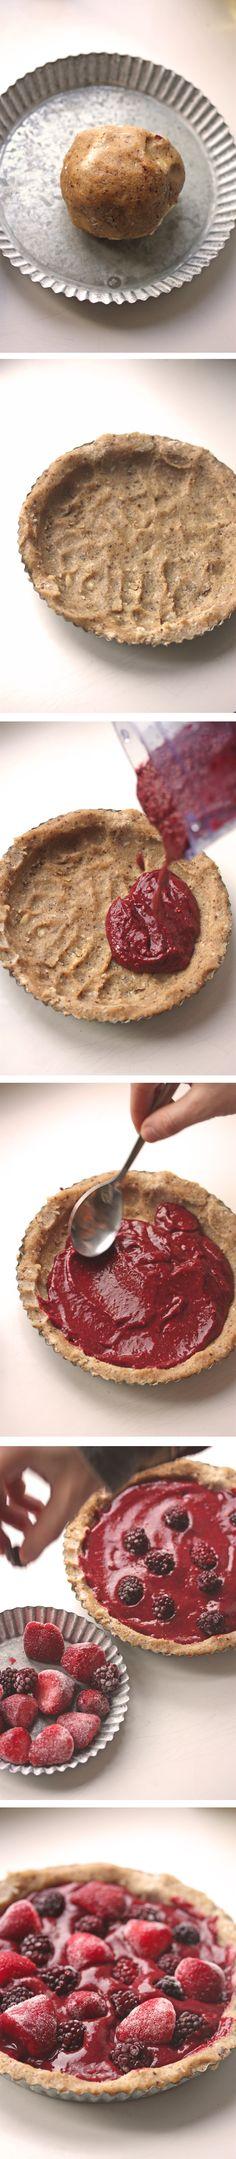 Raw Vegan Simple Chia pudding Pie.     #no-bake #raw #vegan #pie #chia #healthy #dessert #berries #sweet @Lissette Valdes Devereaux